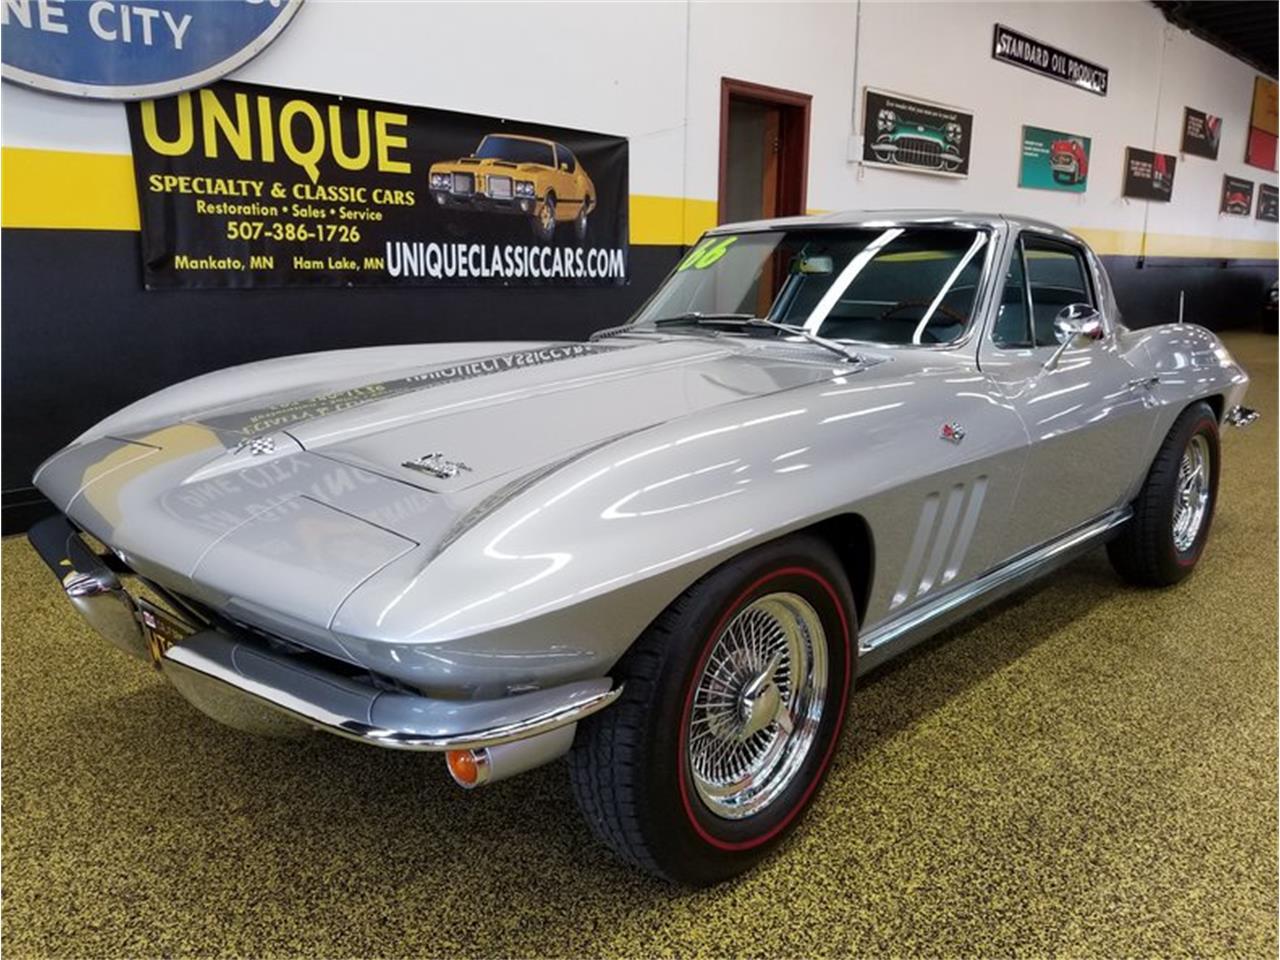 1966 Chevrolet Corvette Coupe For Sale Cc 1036506 Large Picture Of 66 M7ru